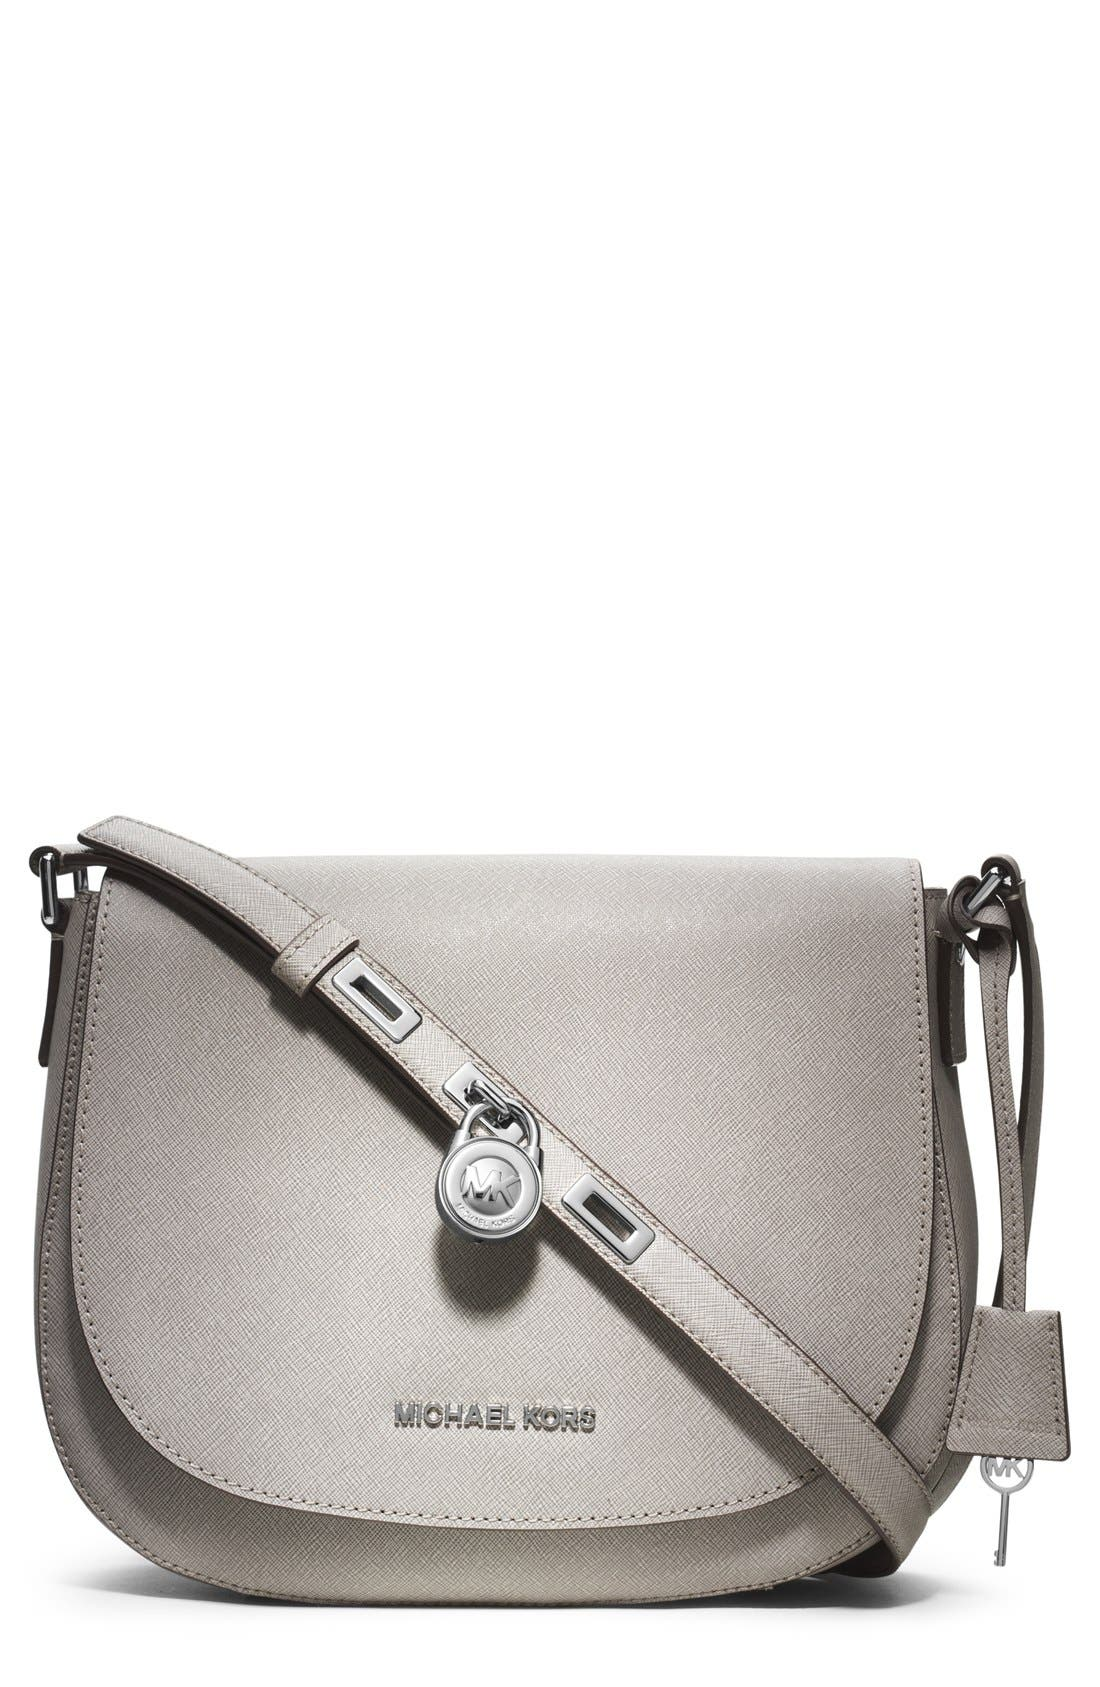 Main Image - MICHAEL Michael Kors 'Large' Saffiano Leather Crossbody Bag